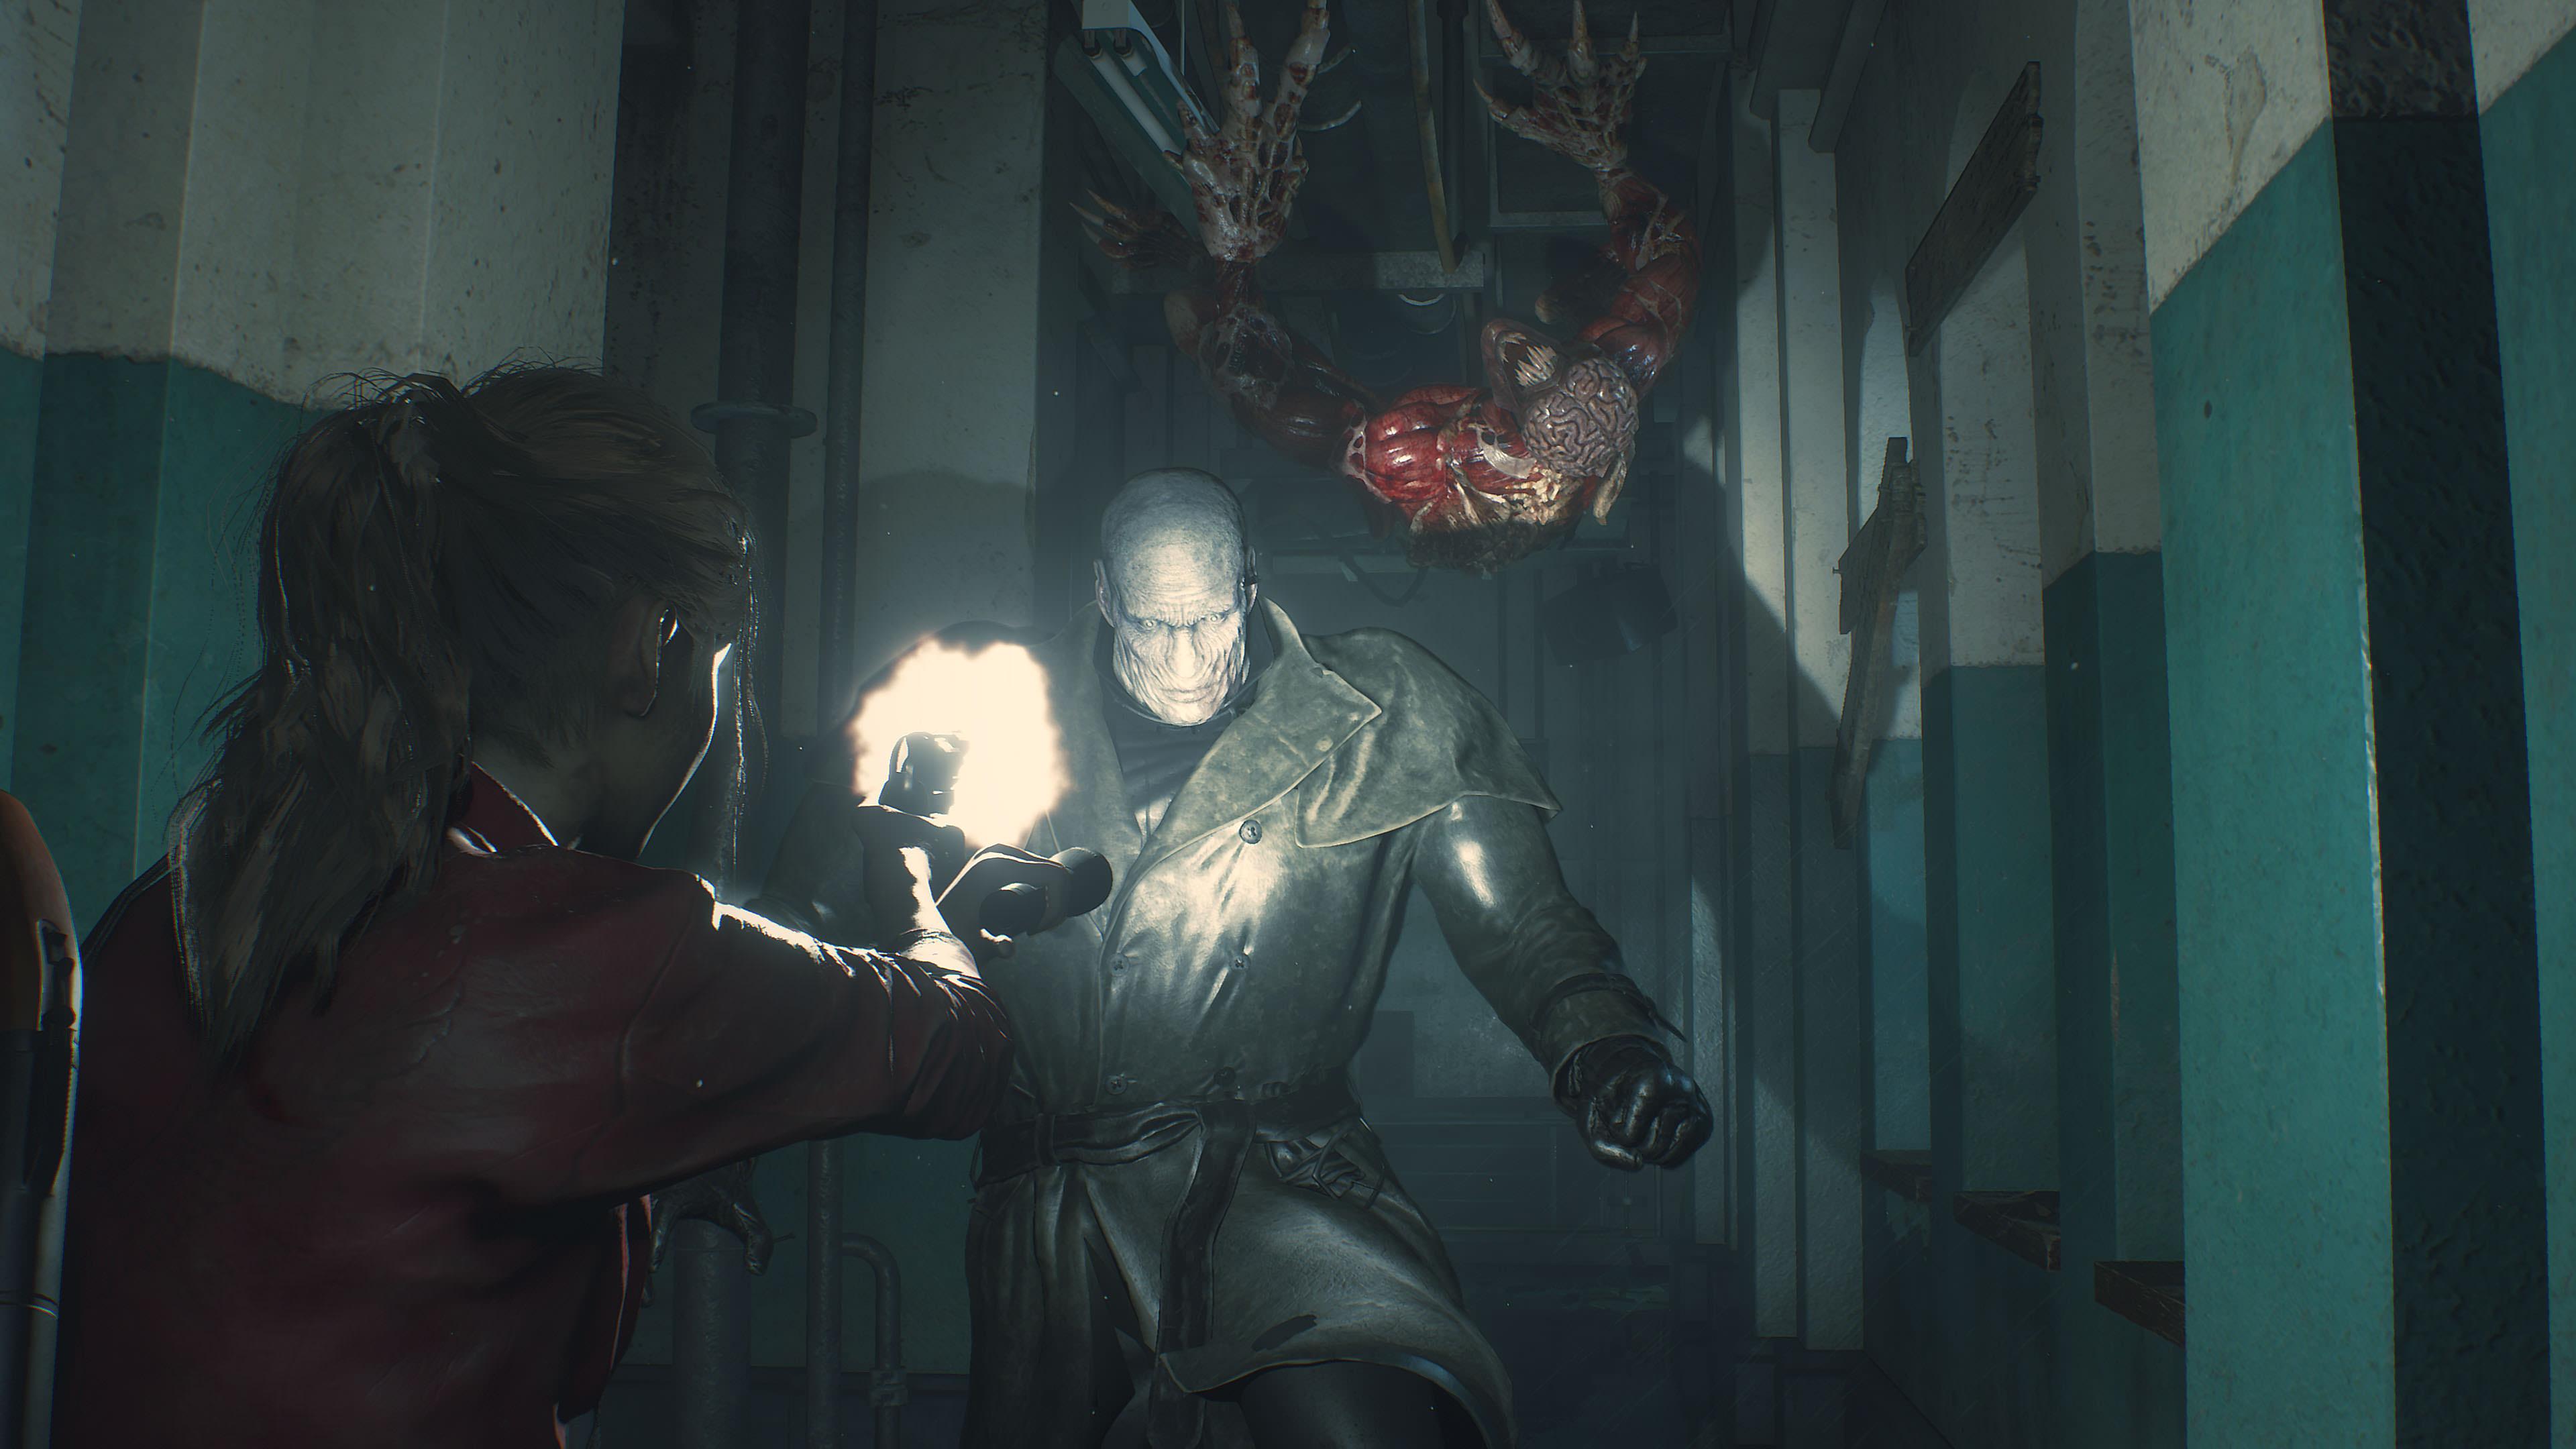 Resident Evil Ambassador invita ahora a salir a ciudades de EE. UU